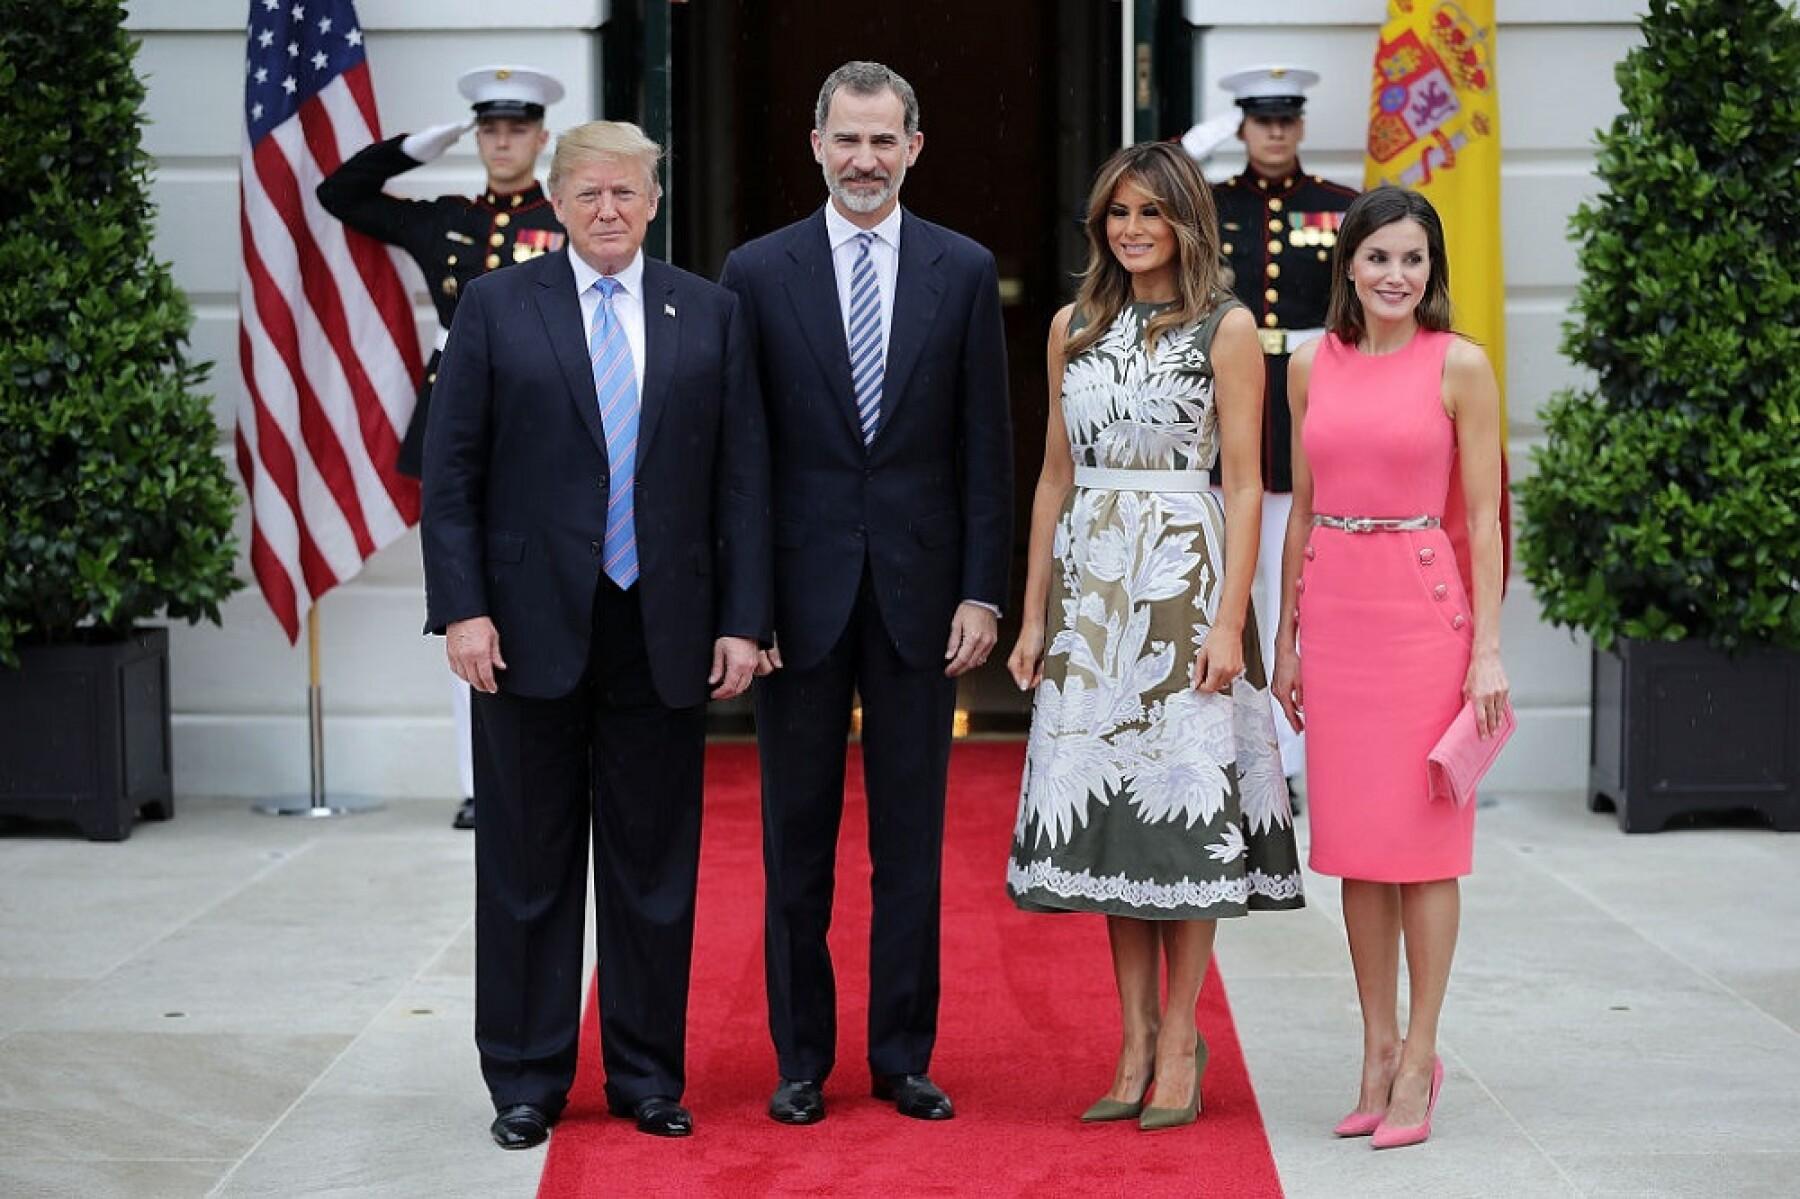 Donald Trump, rey Felipe VI, Melania Trump y la reina Letizia de España